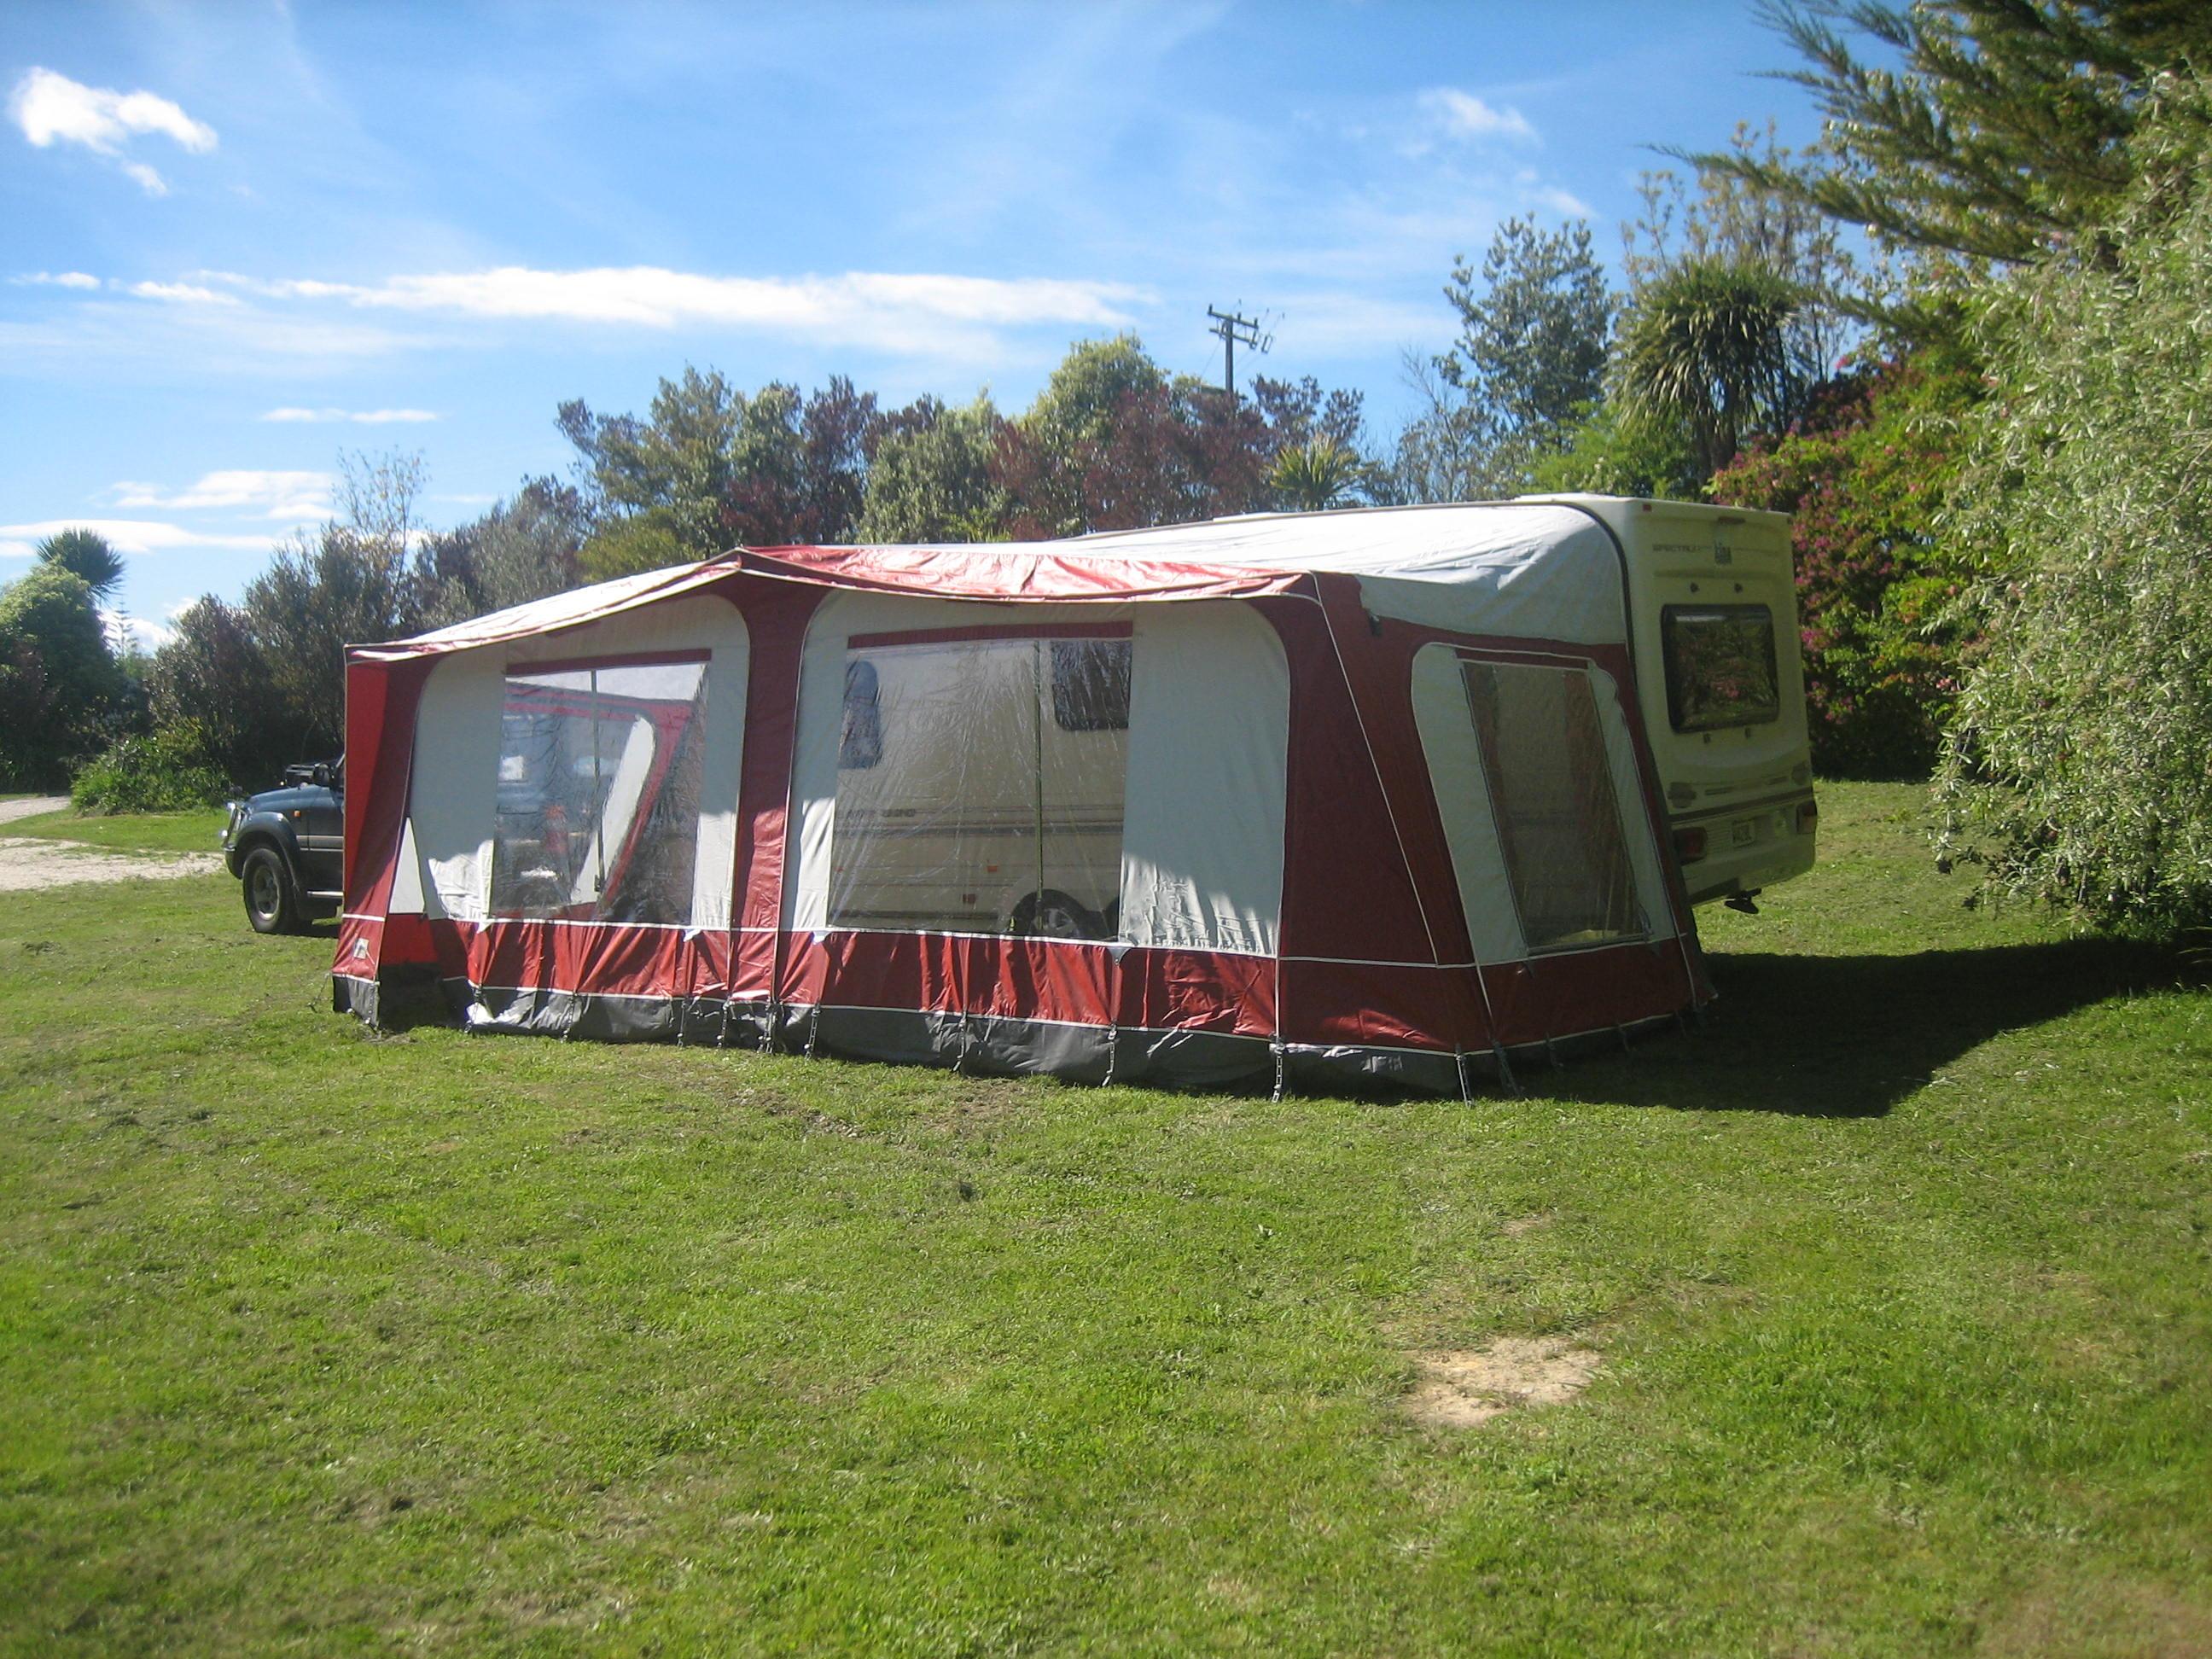 Kina Campers img 0854 Caravan 4/5 berth large 26 Abbey Spectrum 520